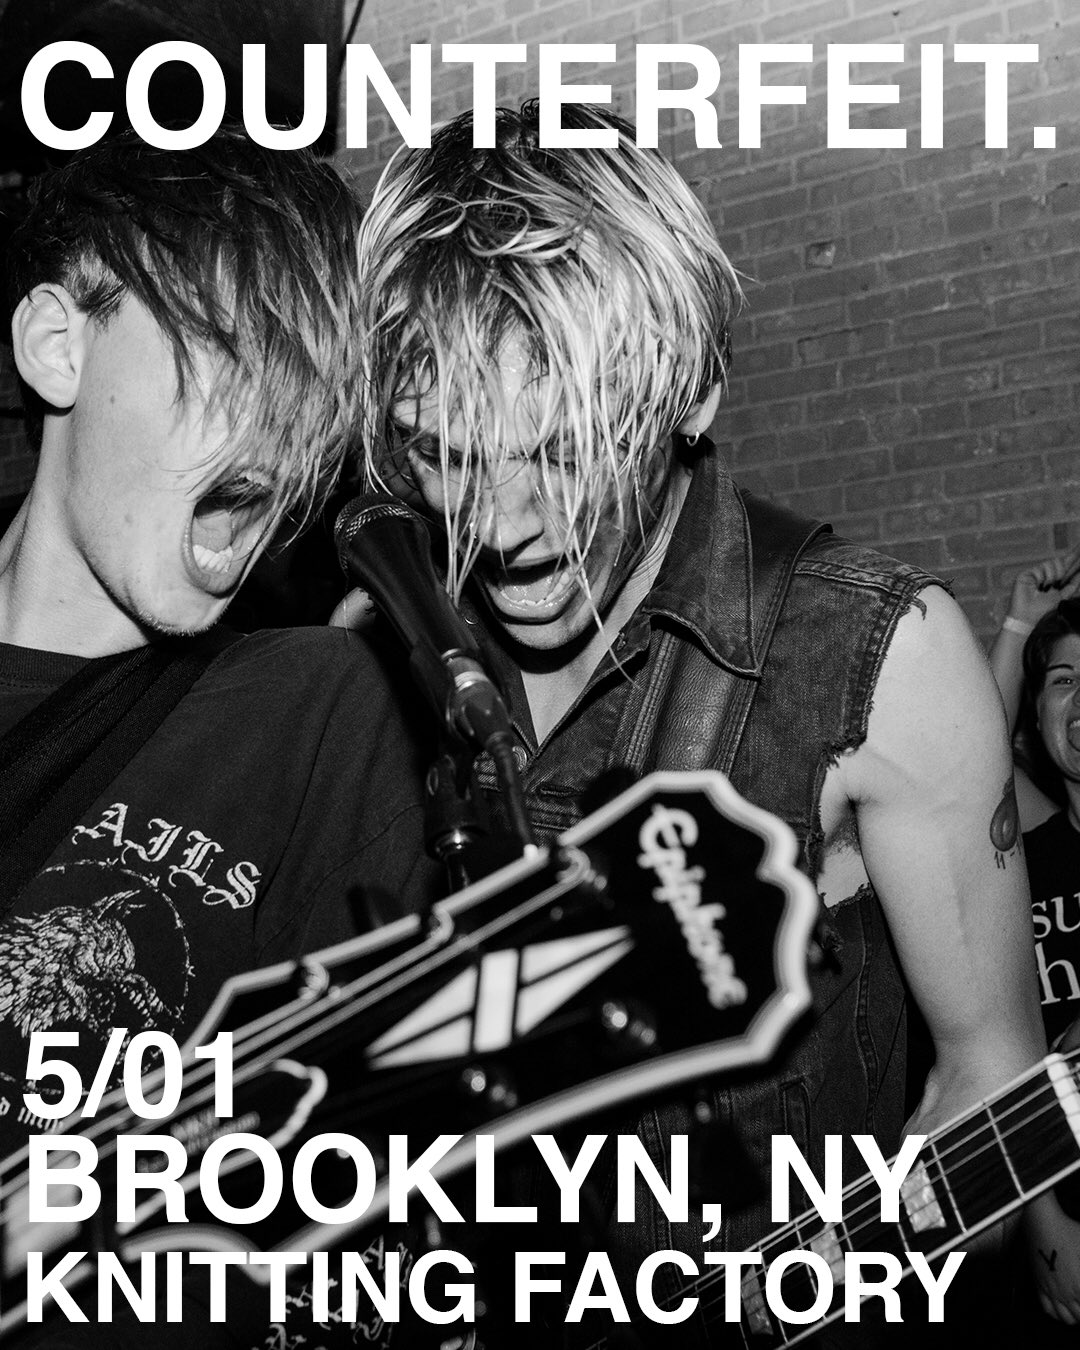 New York New York. See you tonight. X https://t.co/FIXf9B4B4f